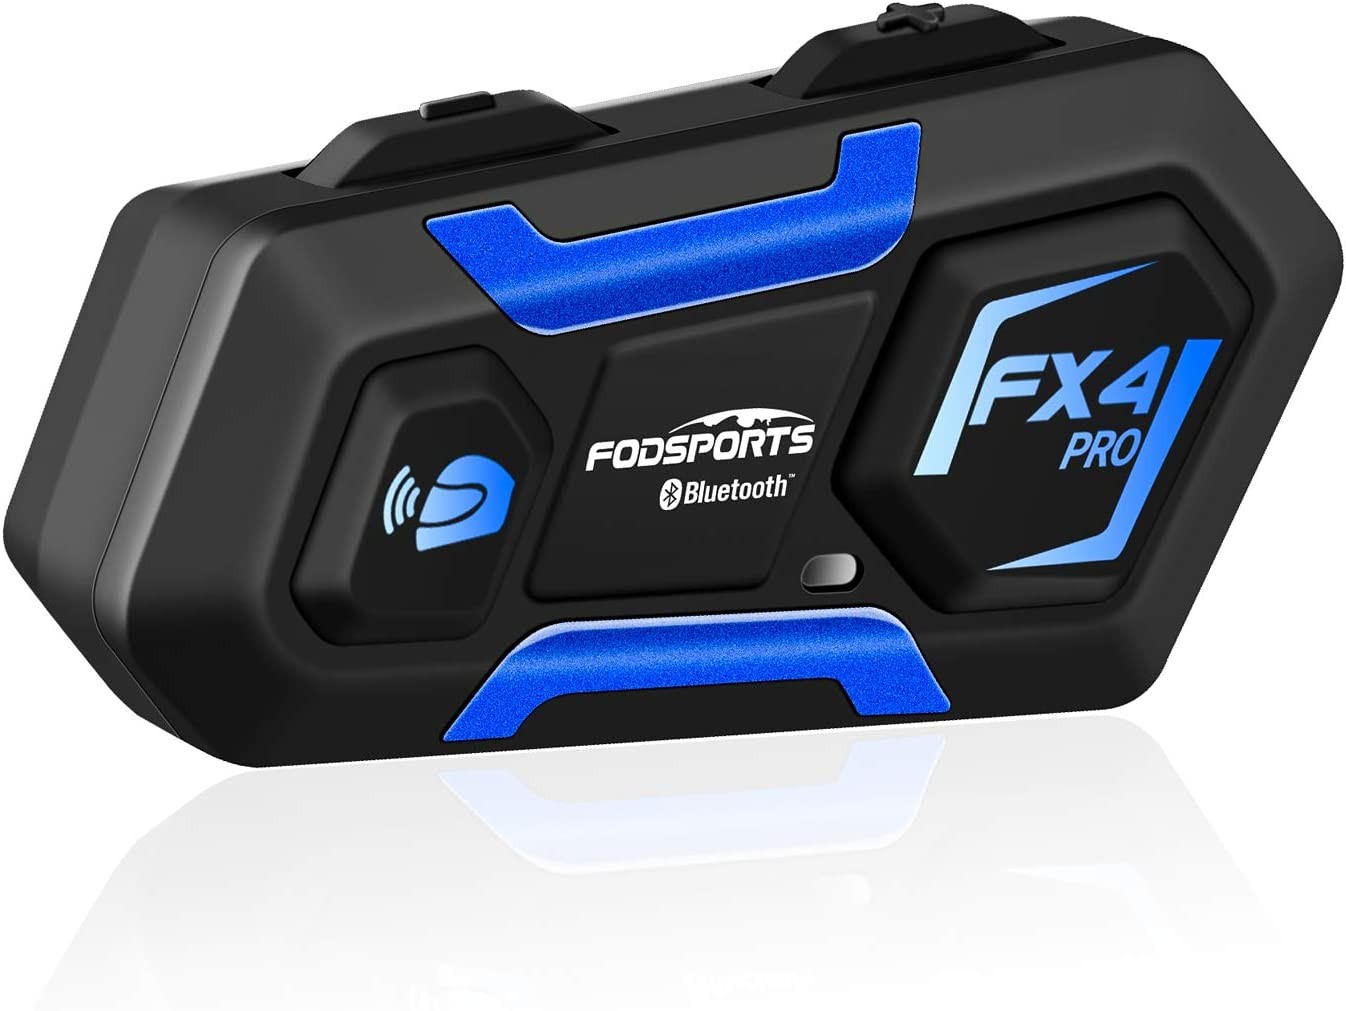 FODSPORTS FX4 Intercomunicador Bluetooth De Casco Para Moto Con Mirada De Ciencia Ficción,Sonido Estéreo Hi-Fi,Reduce El Ruido,Los Auriculares Casco De Motocicleta Apoyan GPS Por Voz,FM,Manos Libres